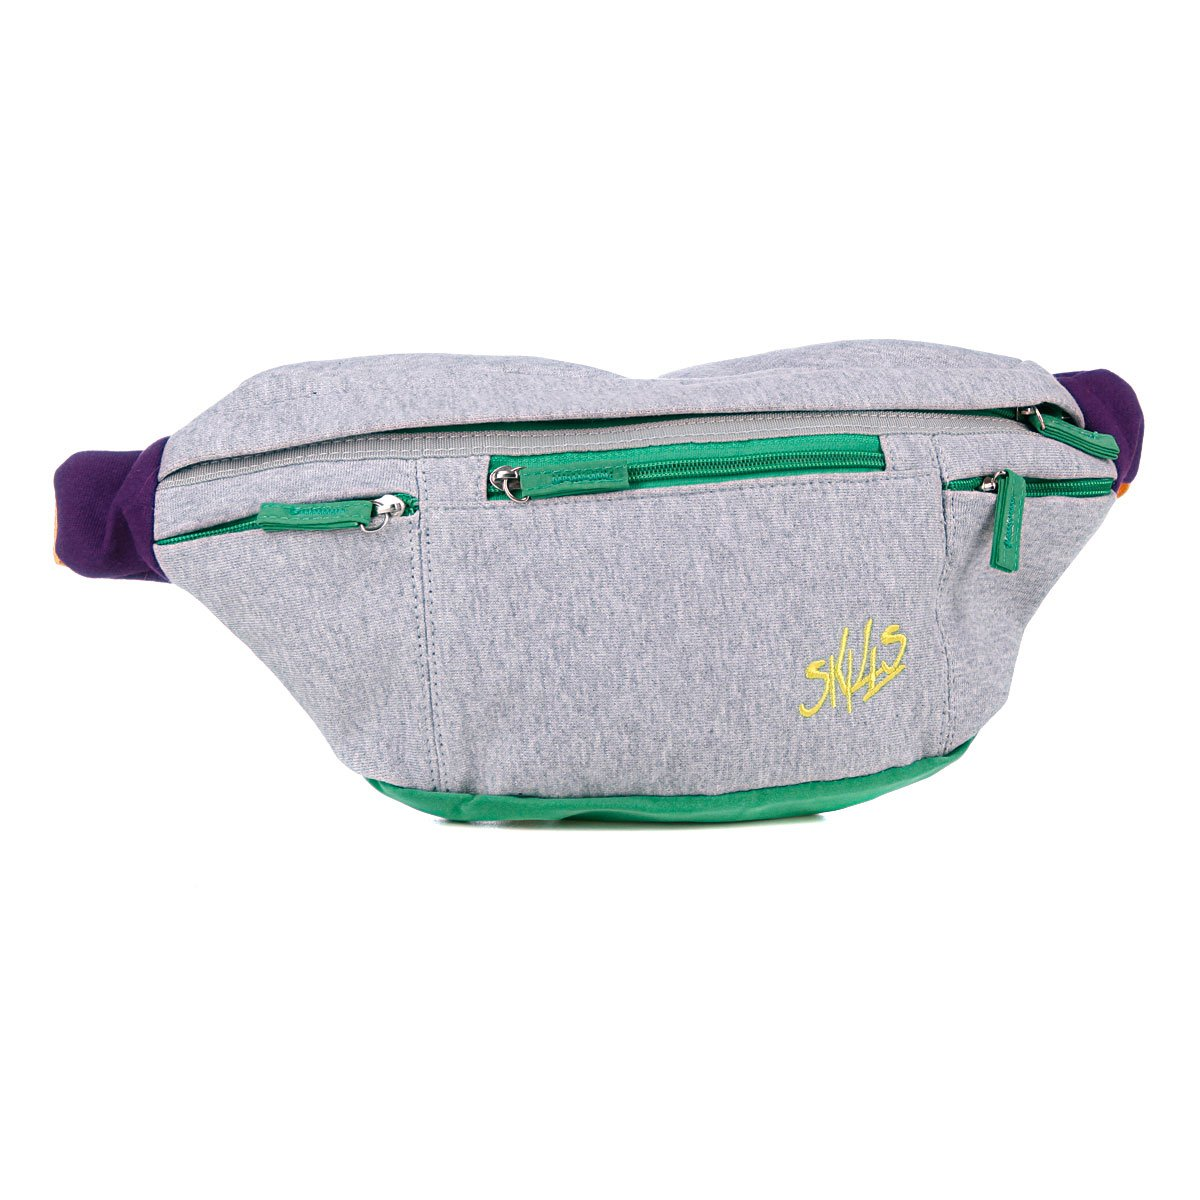 9f7caf48f24a Купить сумку поясная Skills Original Grey Green (280912skils07) в ...